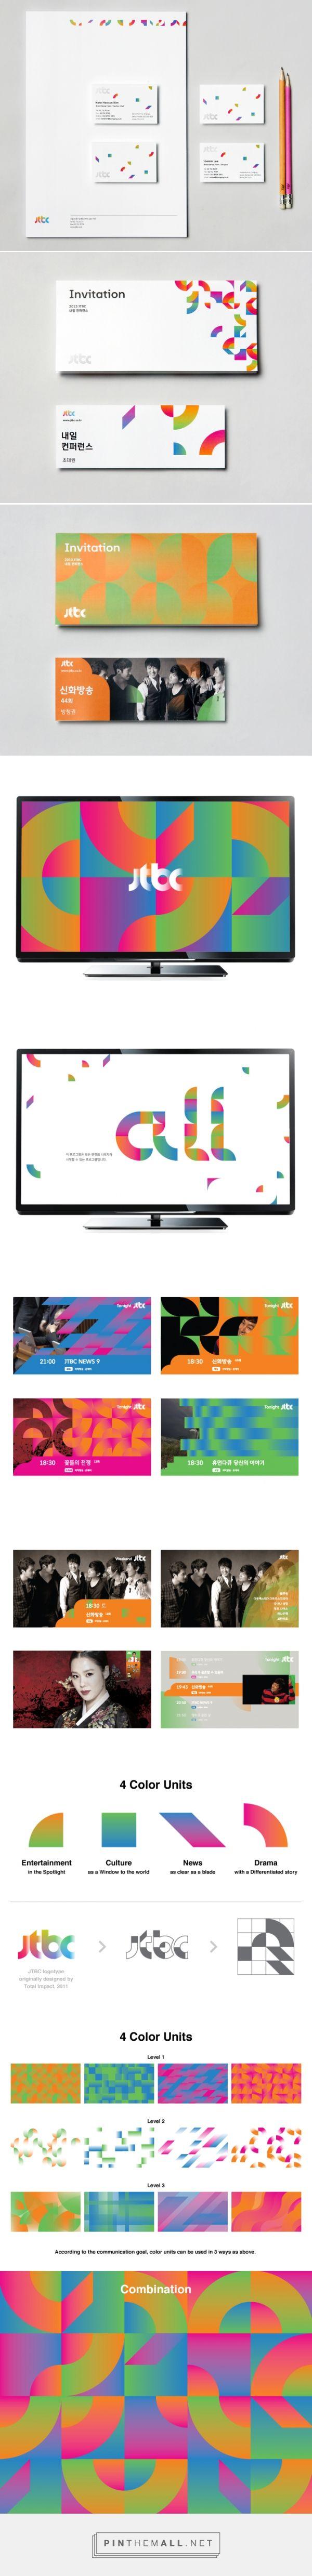 brand identity for JTBC - studio fnt.